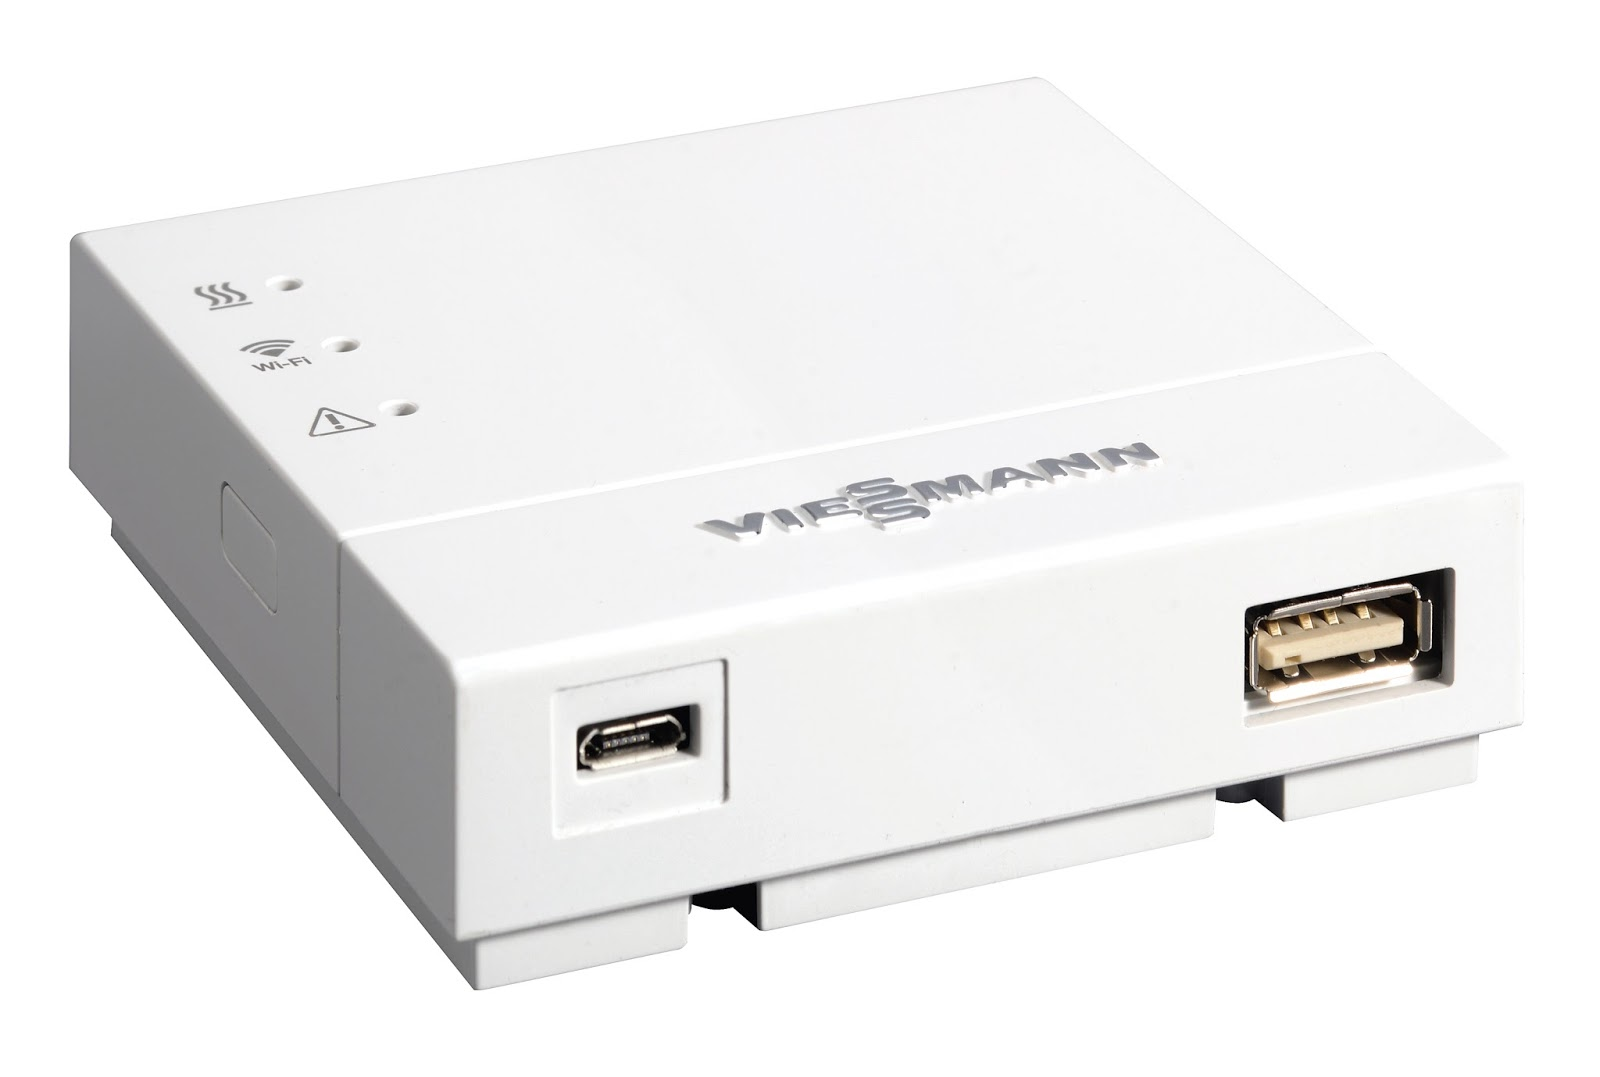 viessmann vitoconnect 100 boitier interface wifi